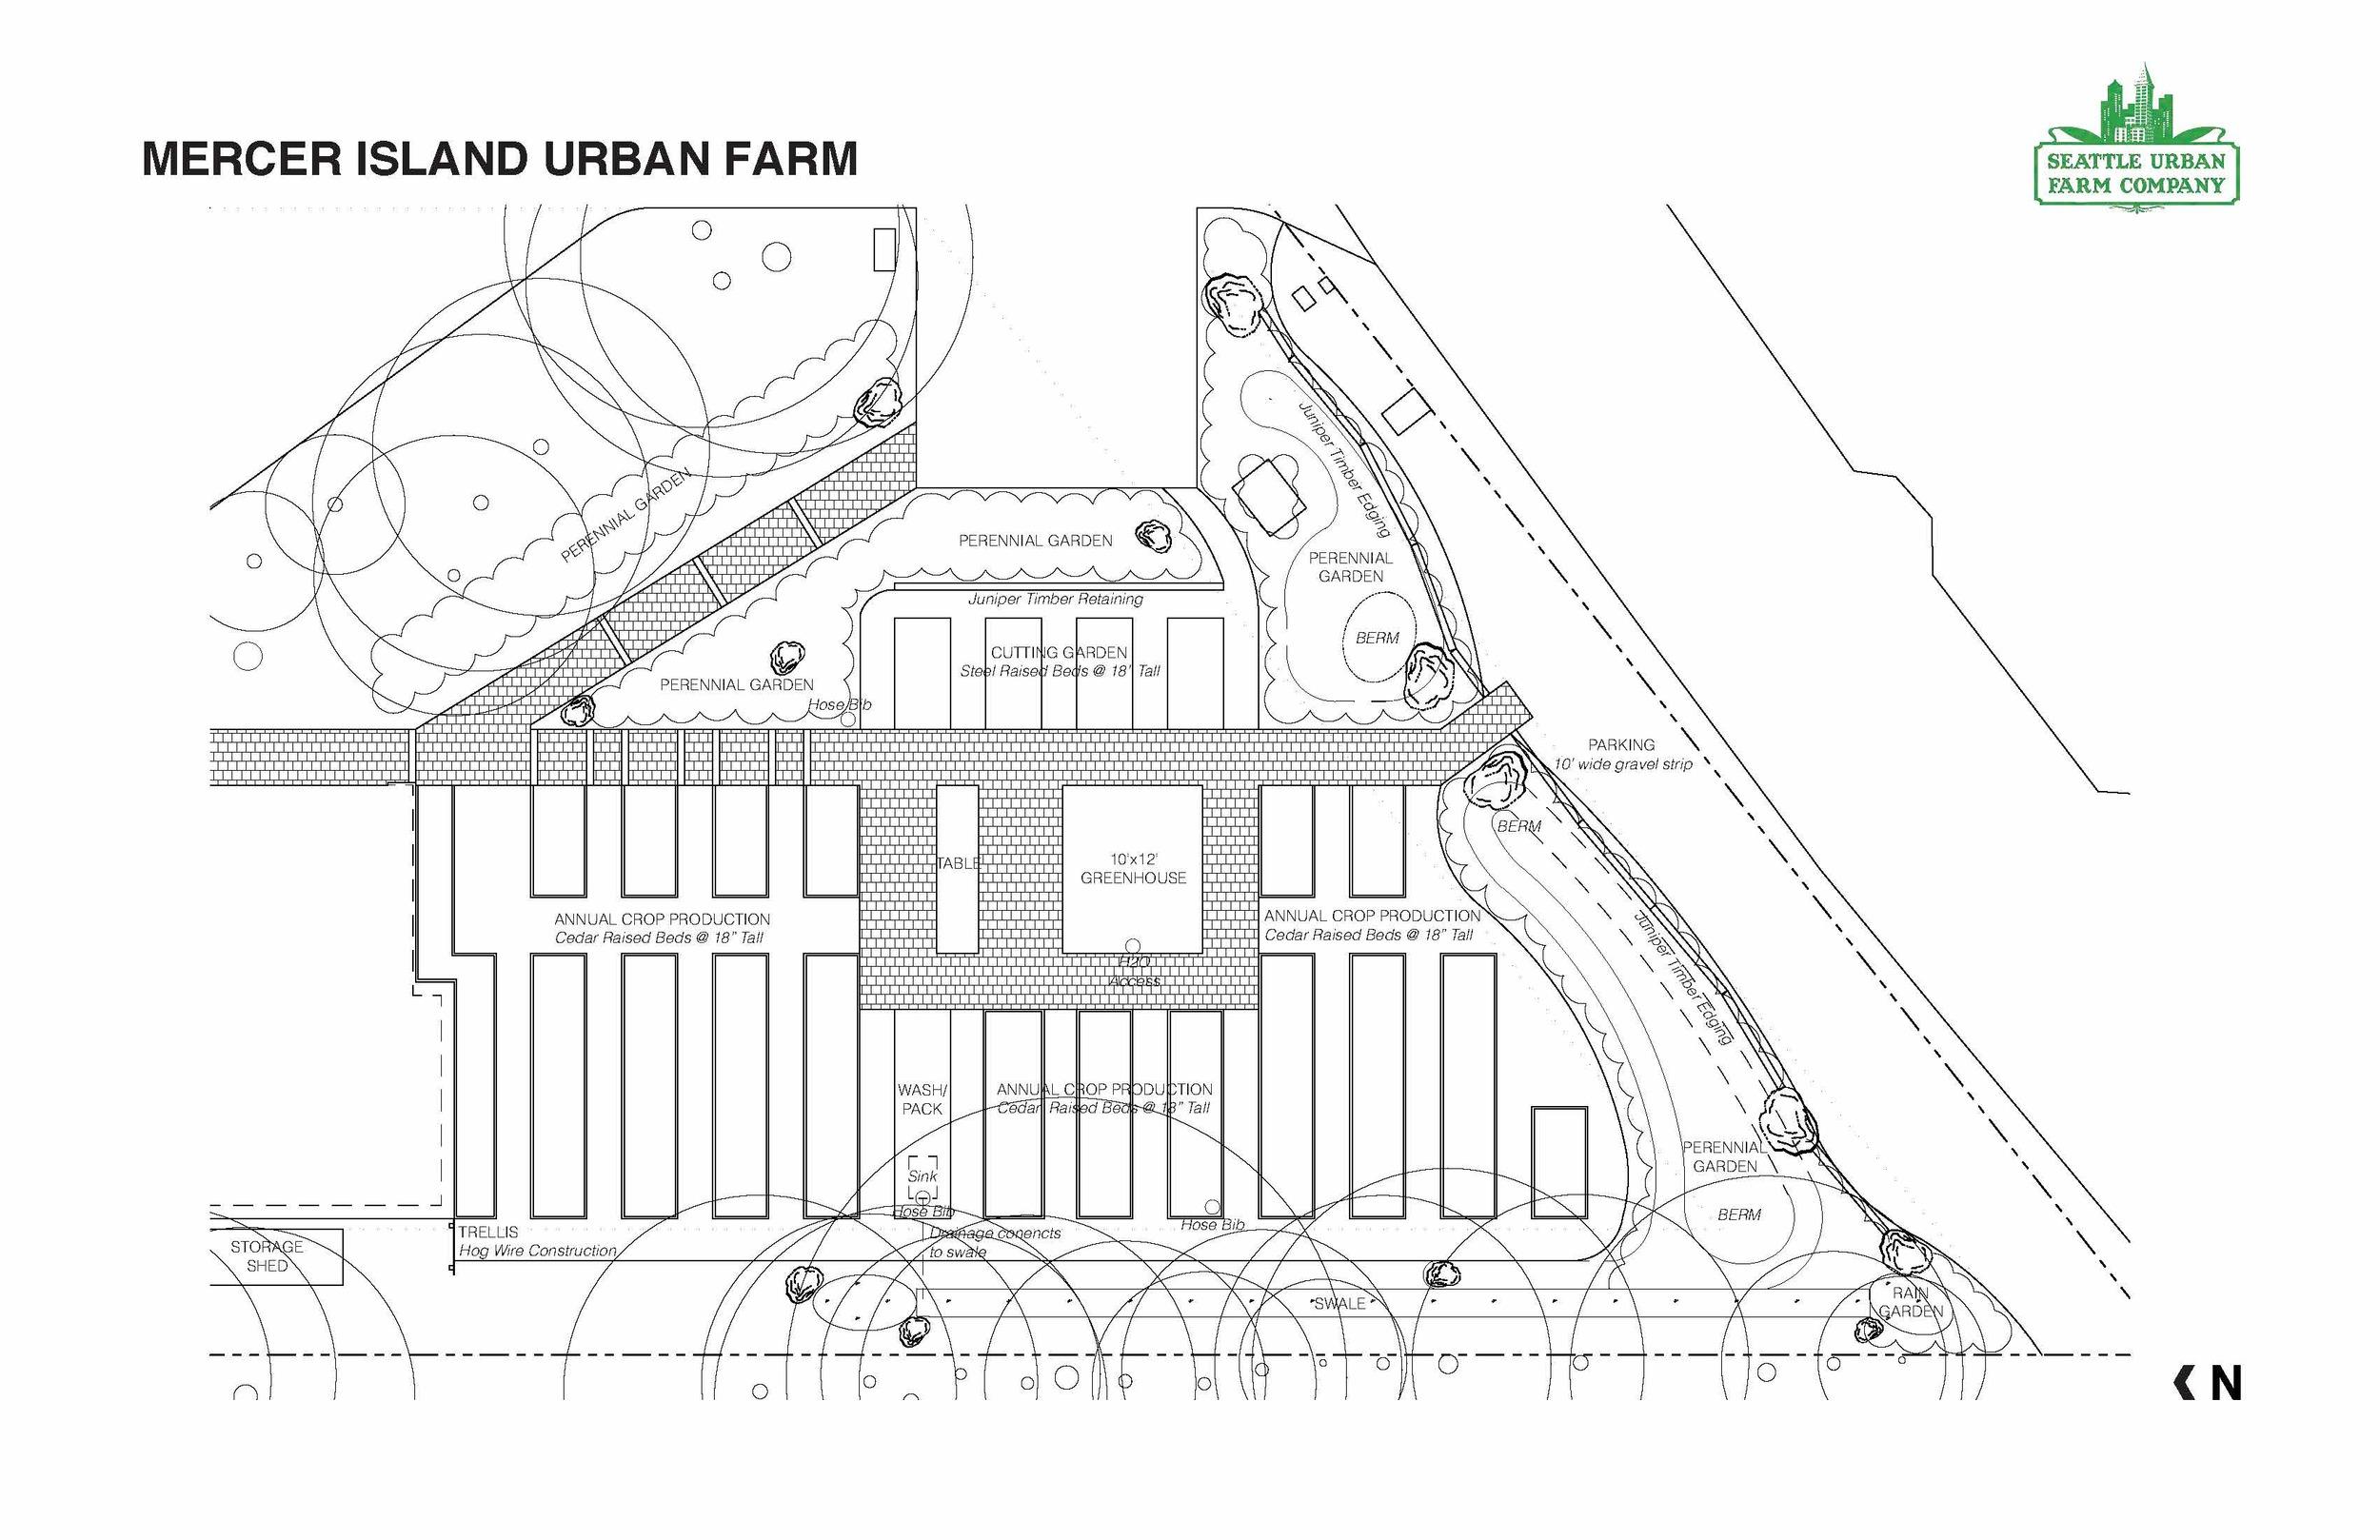 Mercer Island Urban Farm Plan_Seattle Urban Farm Co.